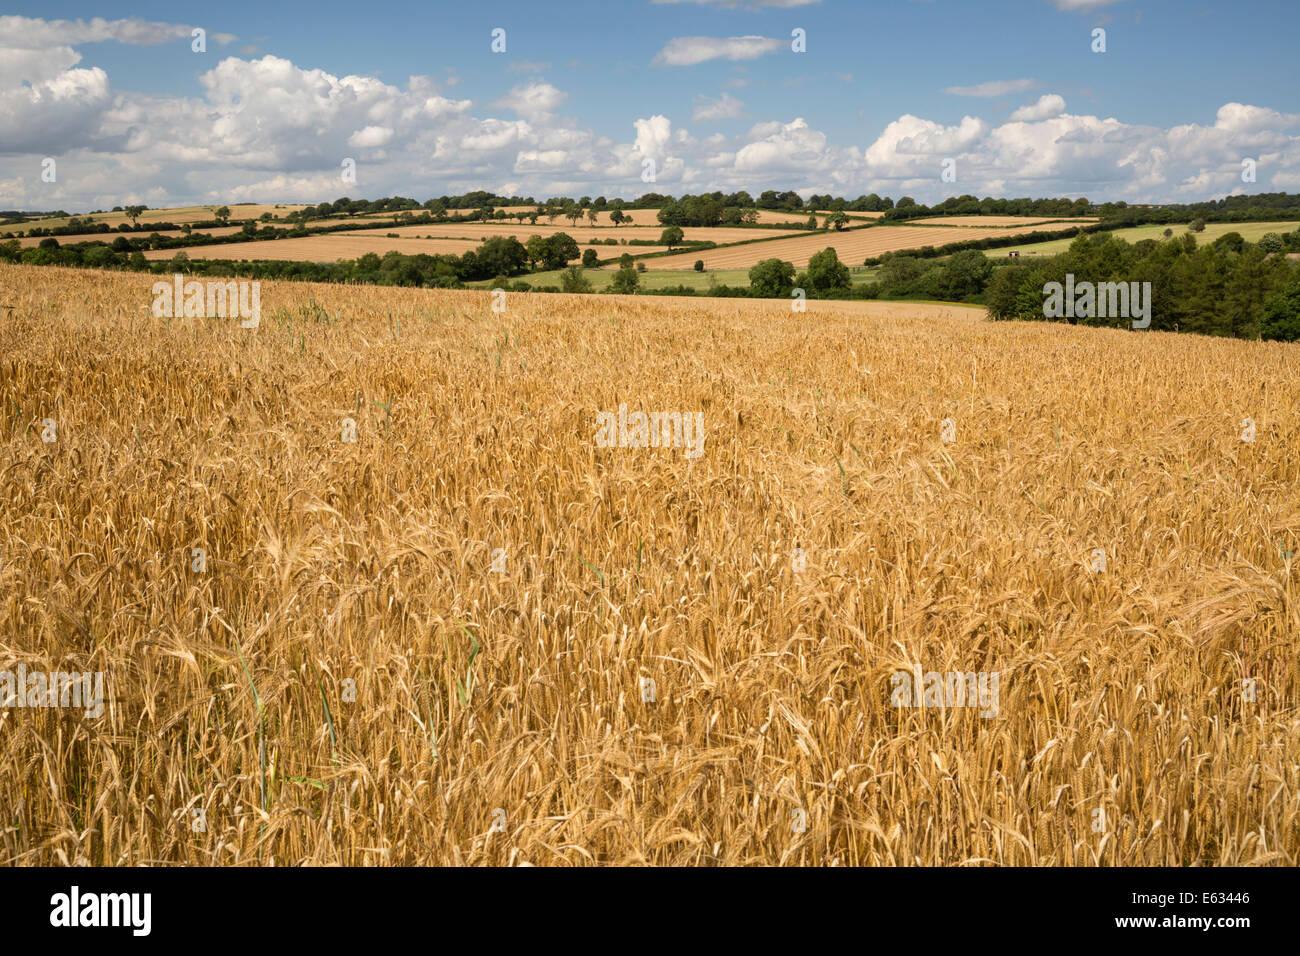 Wheat fields, Guiting Power, Cotswolds, Gloucestershire, England, United Kingdom, Europe - Stock Image